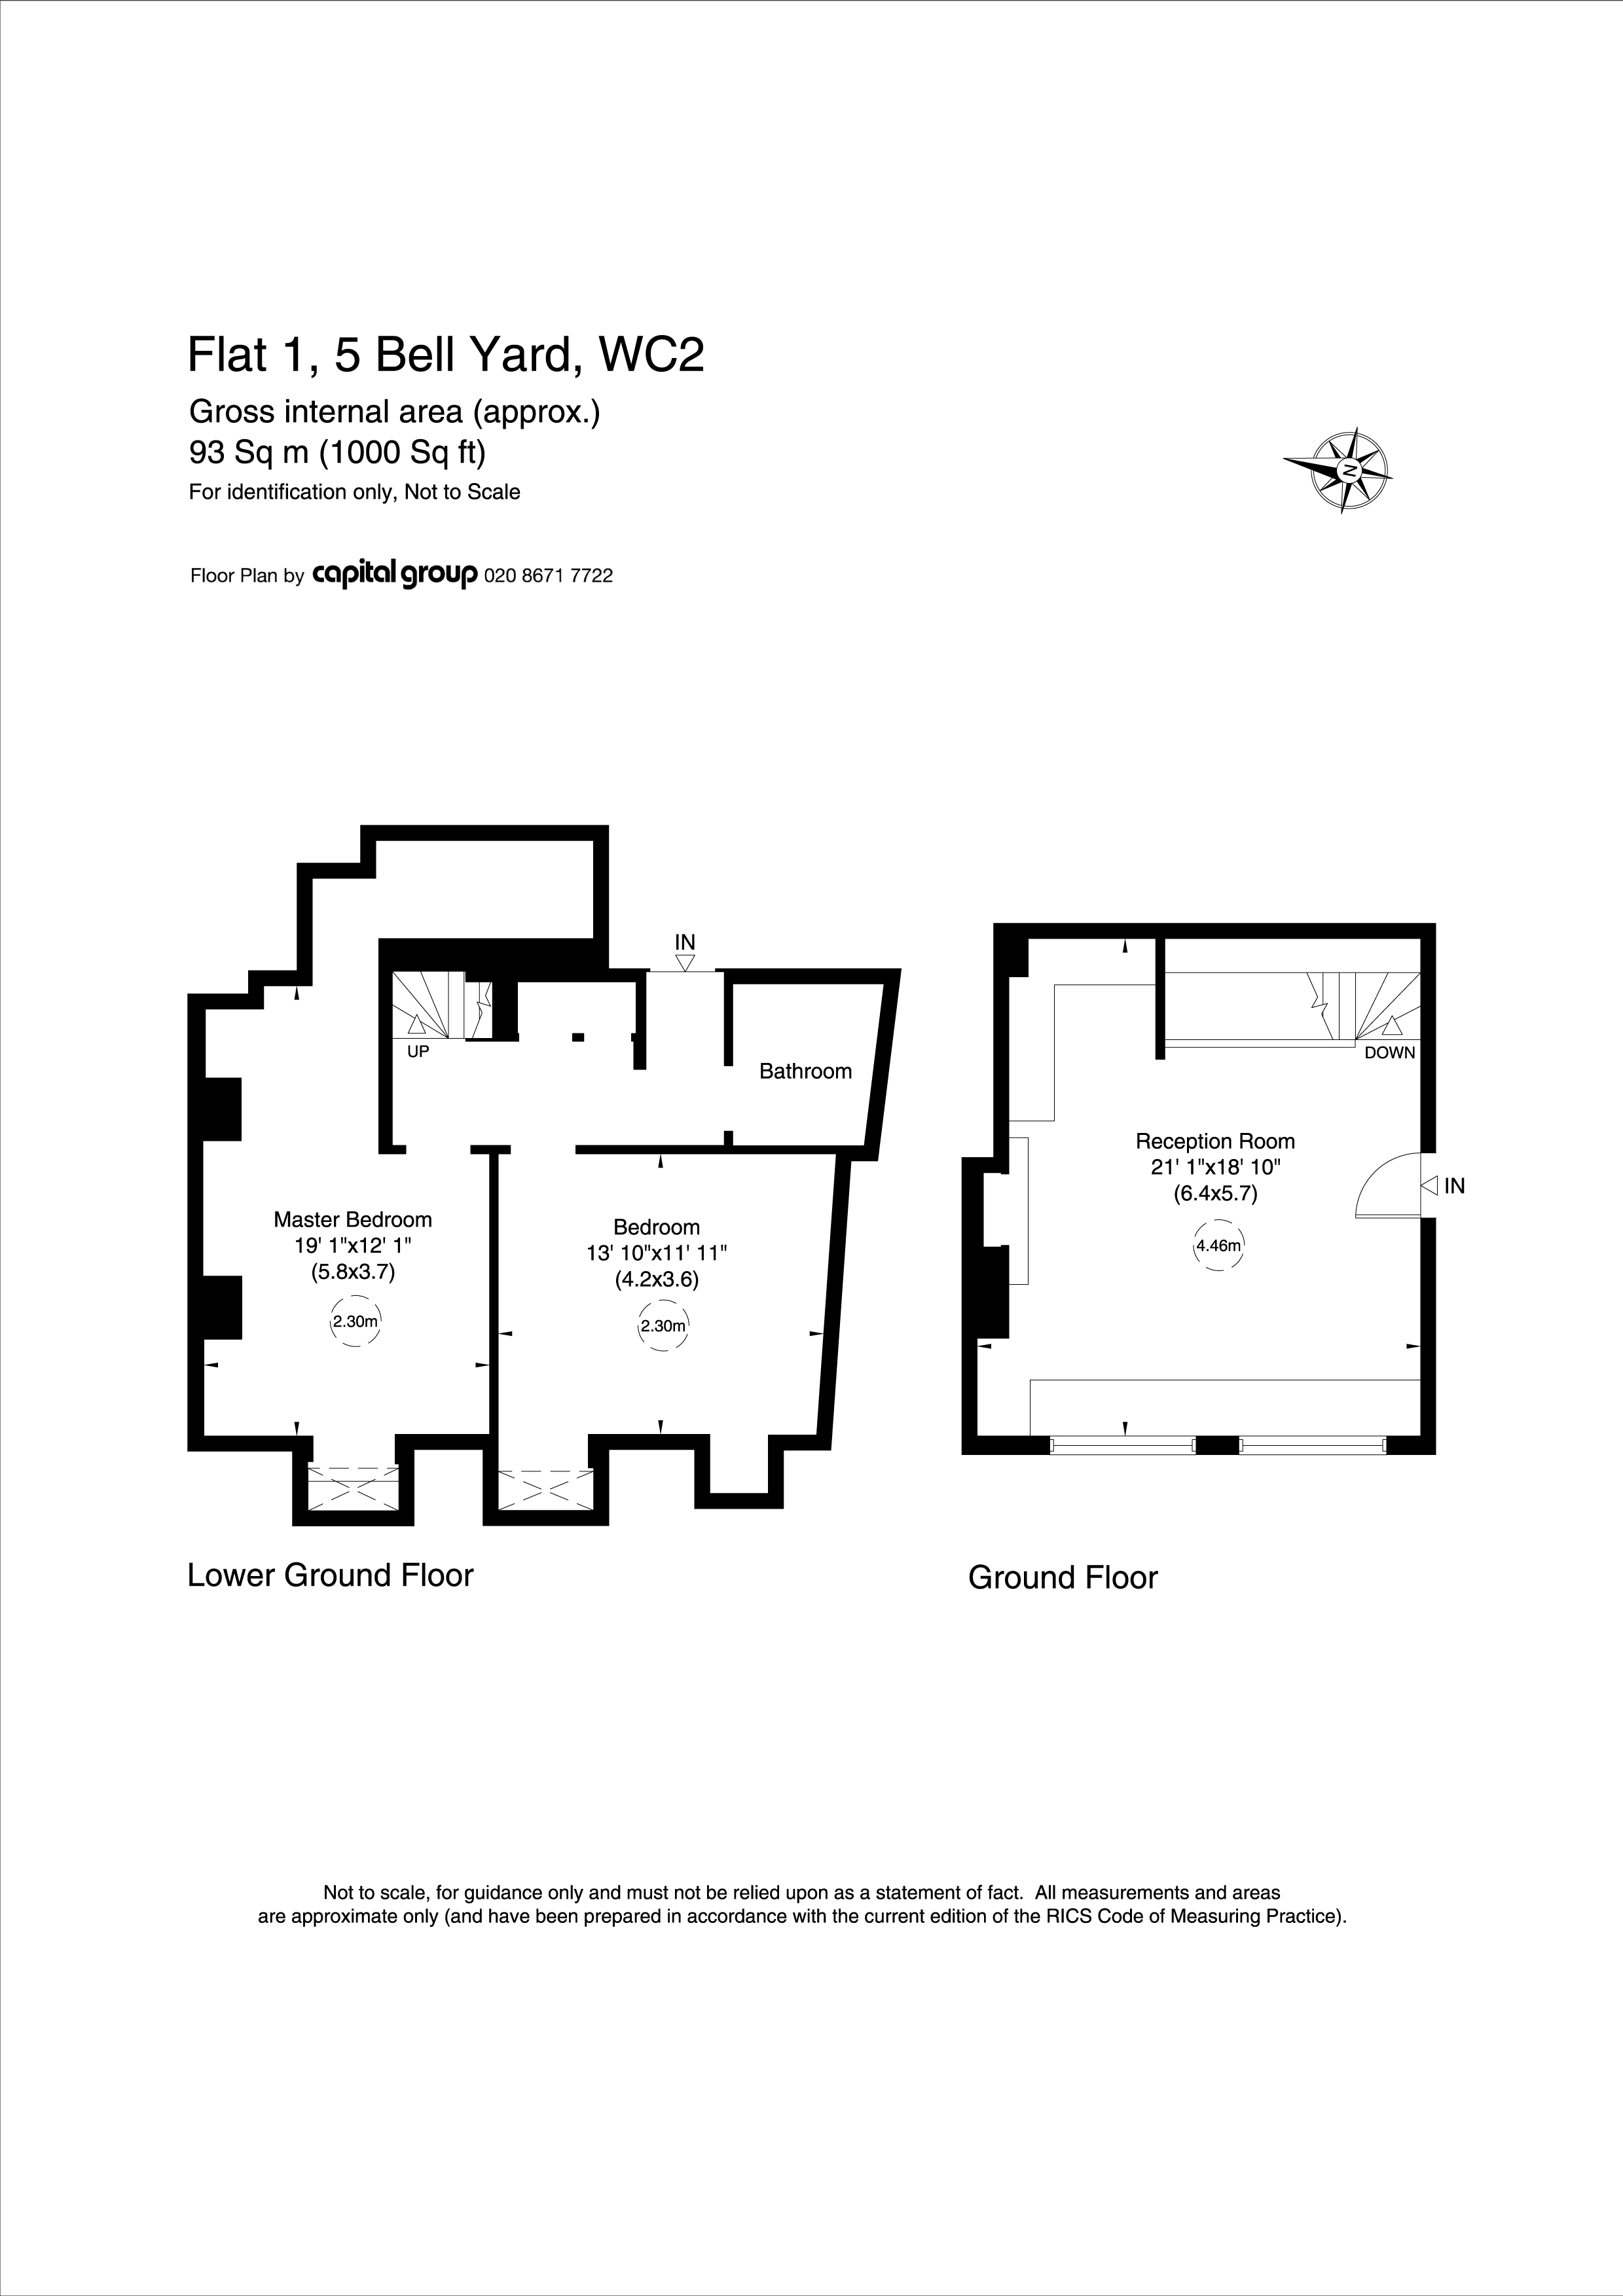 Flat 1, 5 Bell Yard Plan